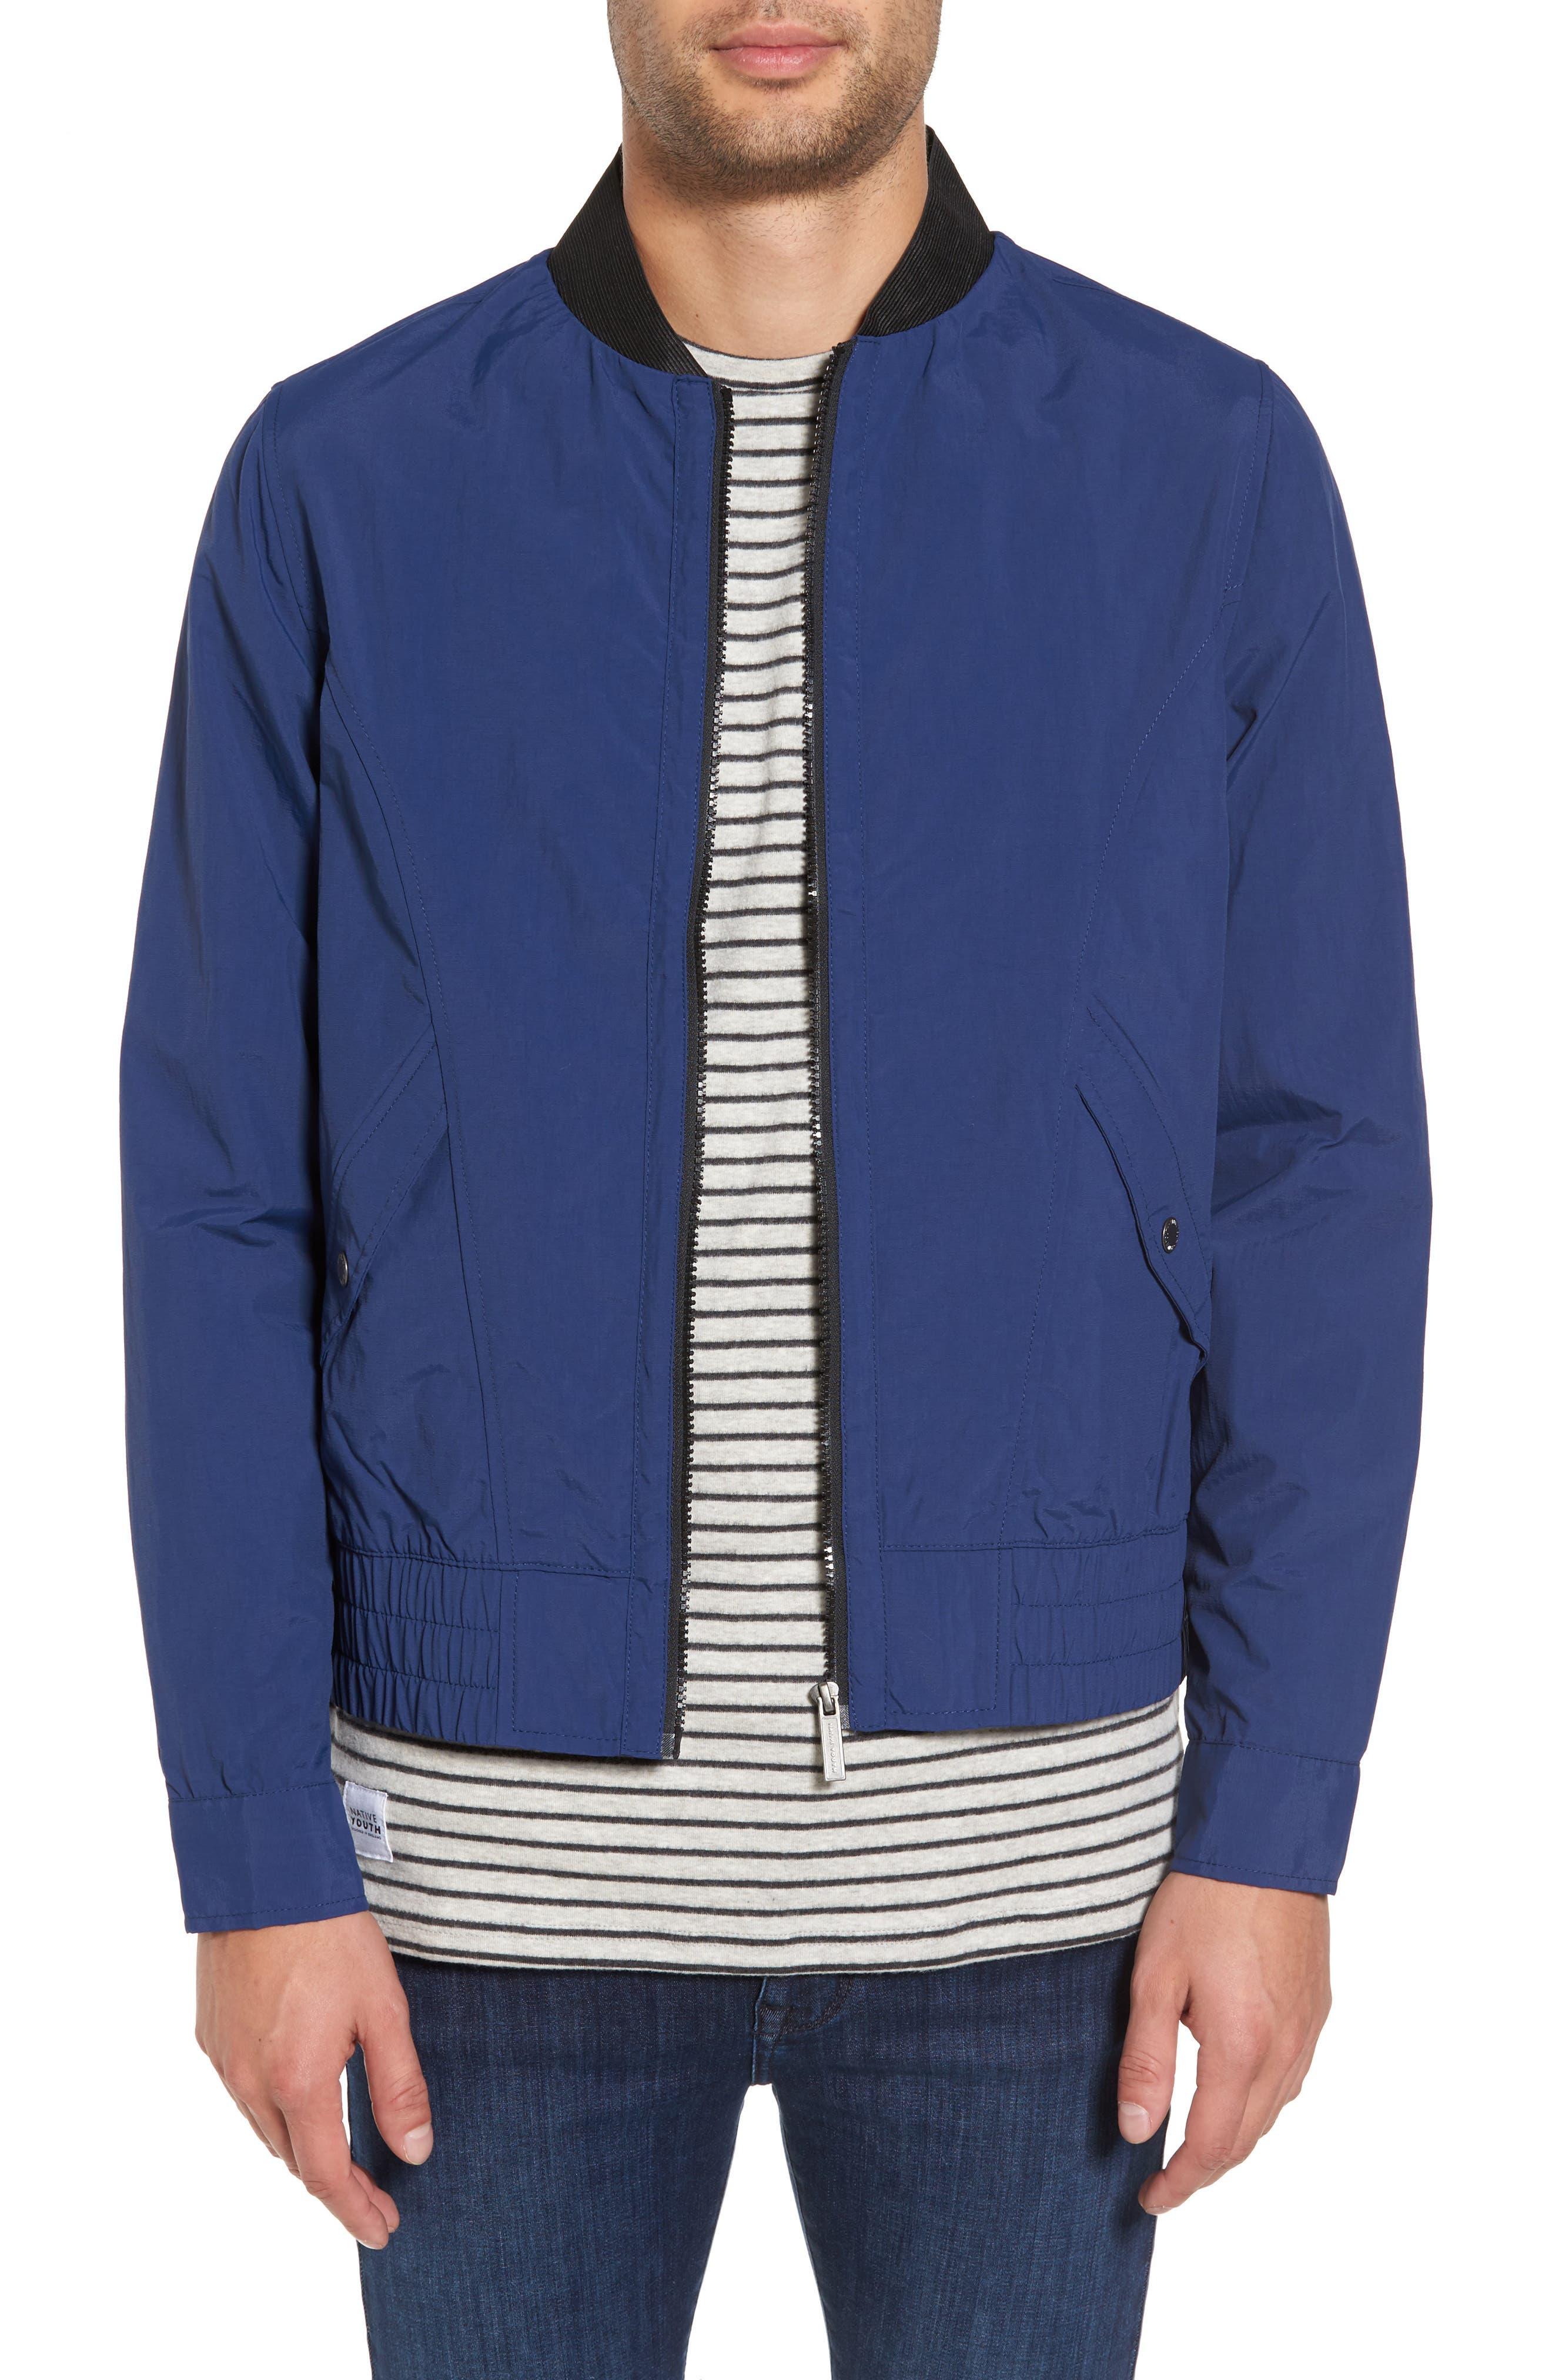 Venture Bomber Jacket,                         Main,                         color, Blue